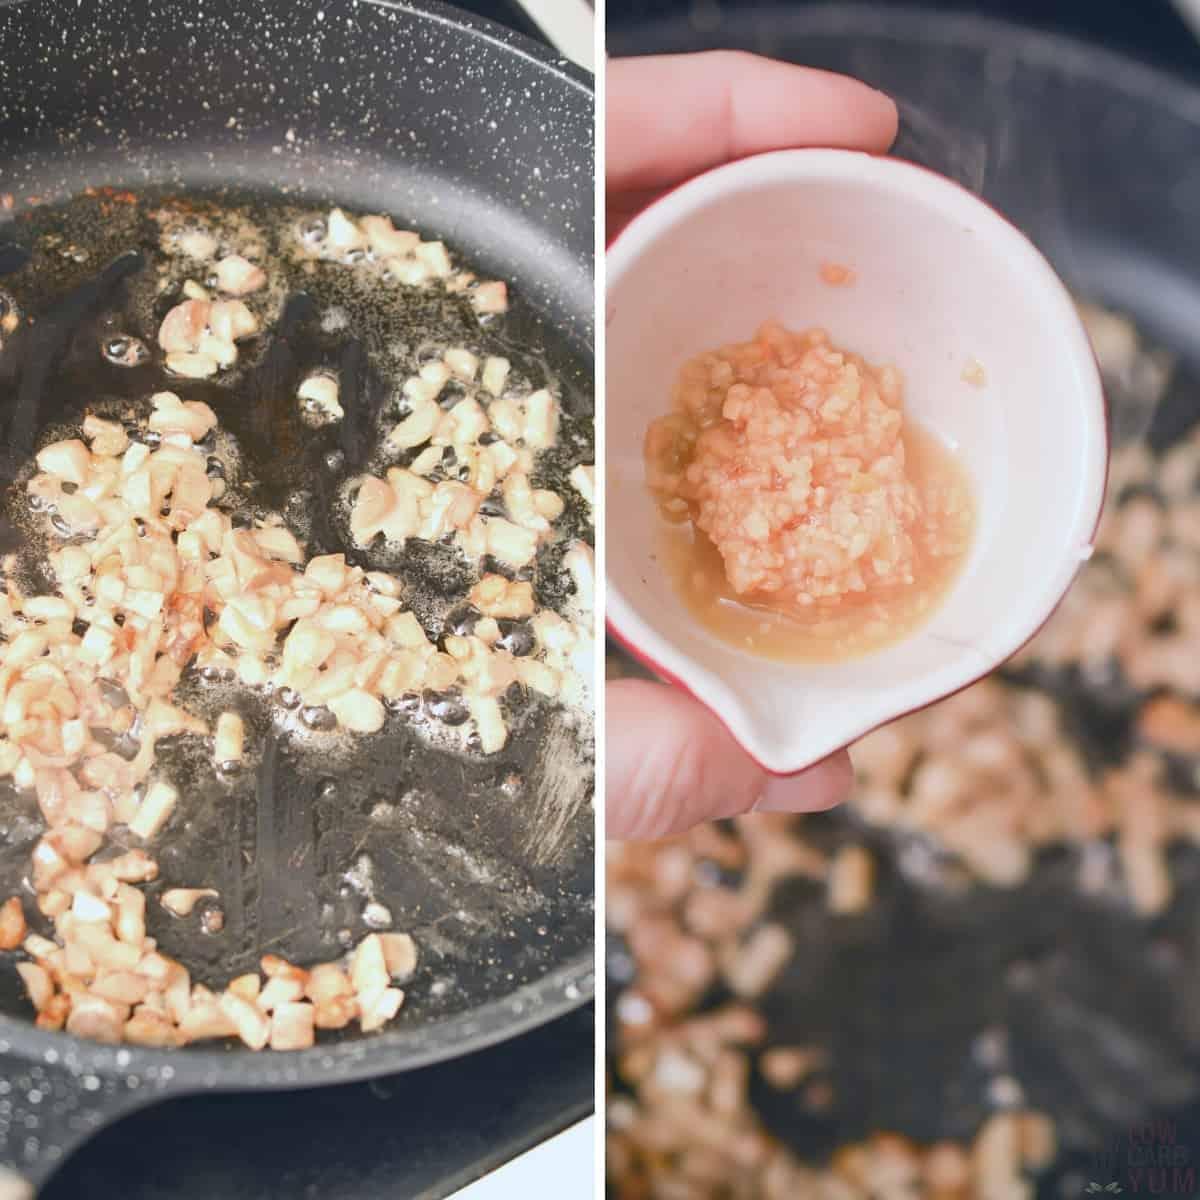 cooking chopped mushroom stems in pan